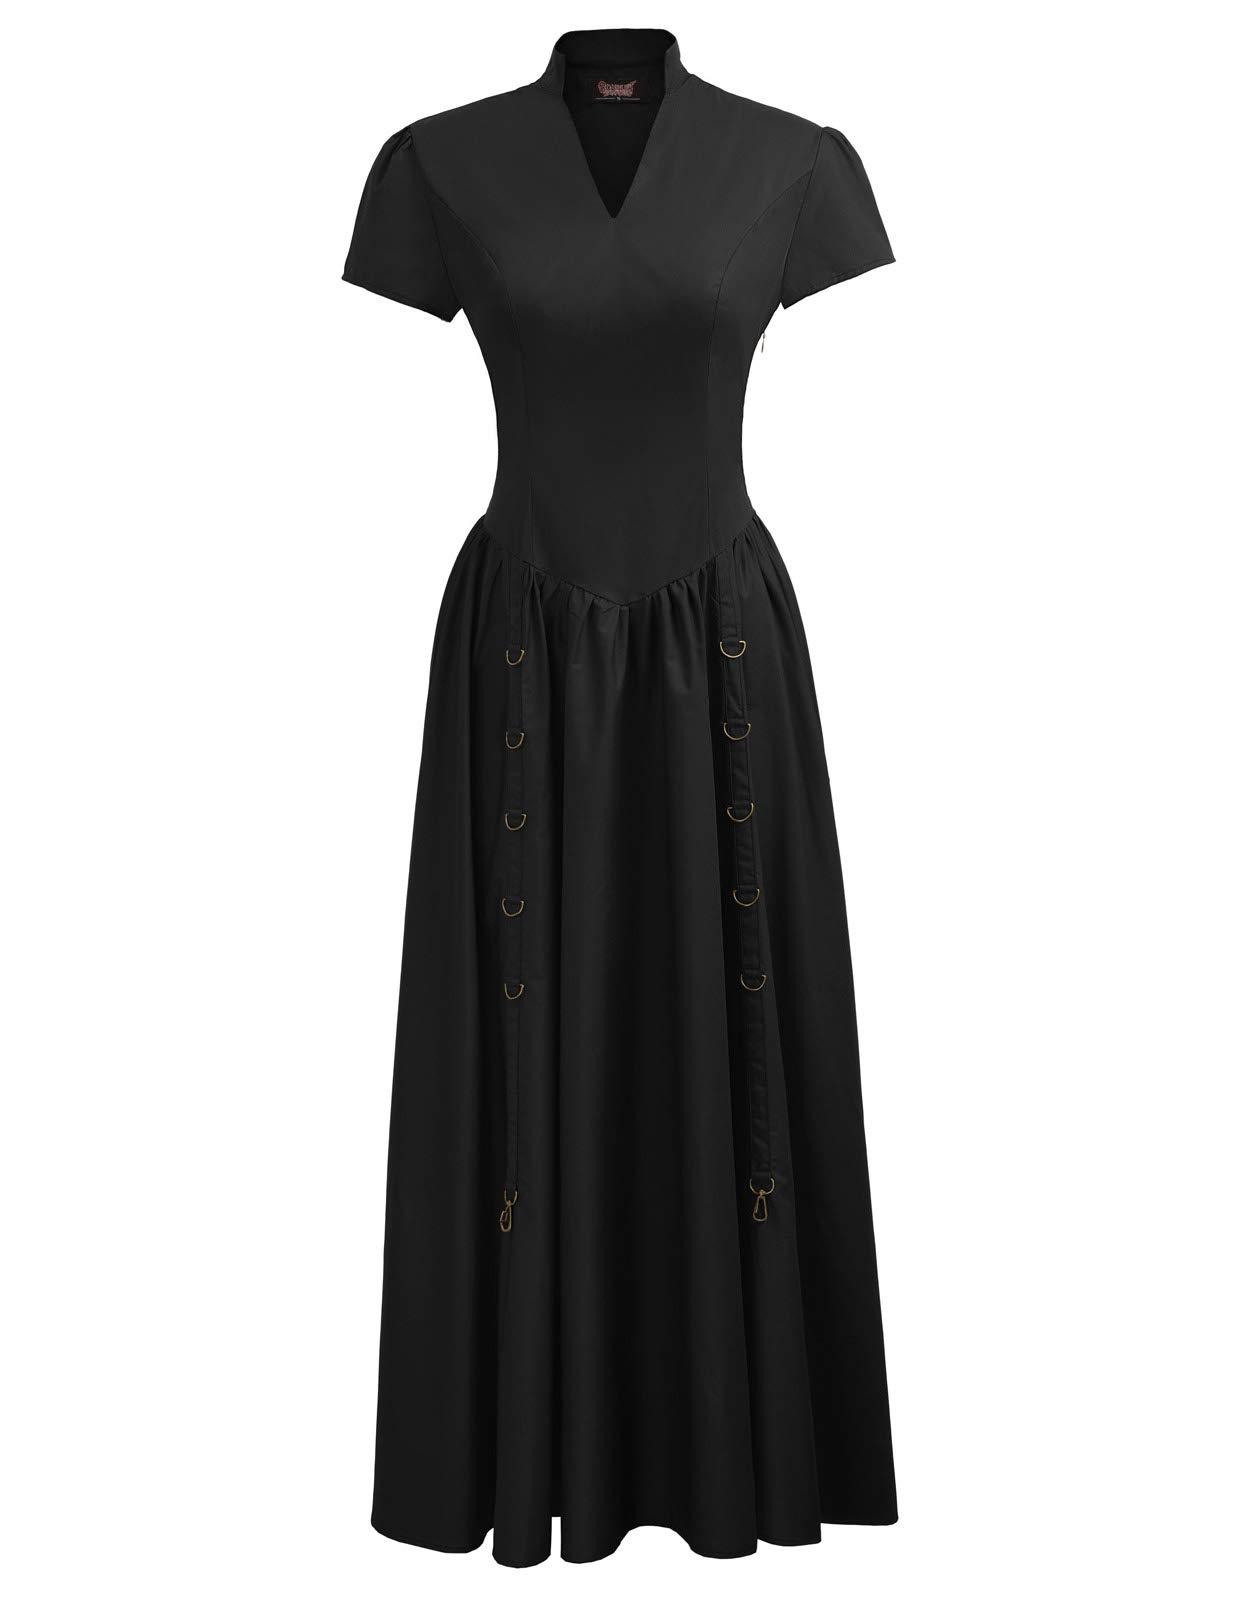 Women Victorian Vintage Steampunk Short Sleeve V-Neck Long Dress 3